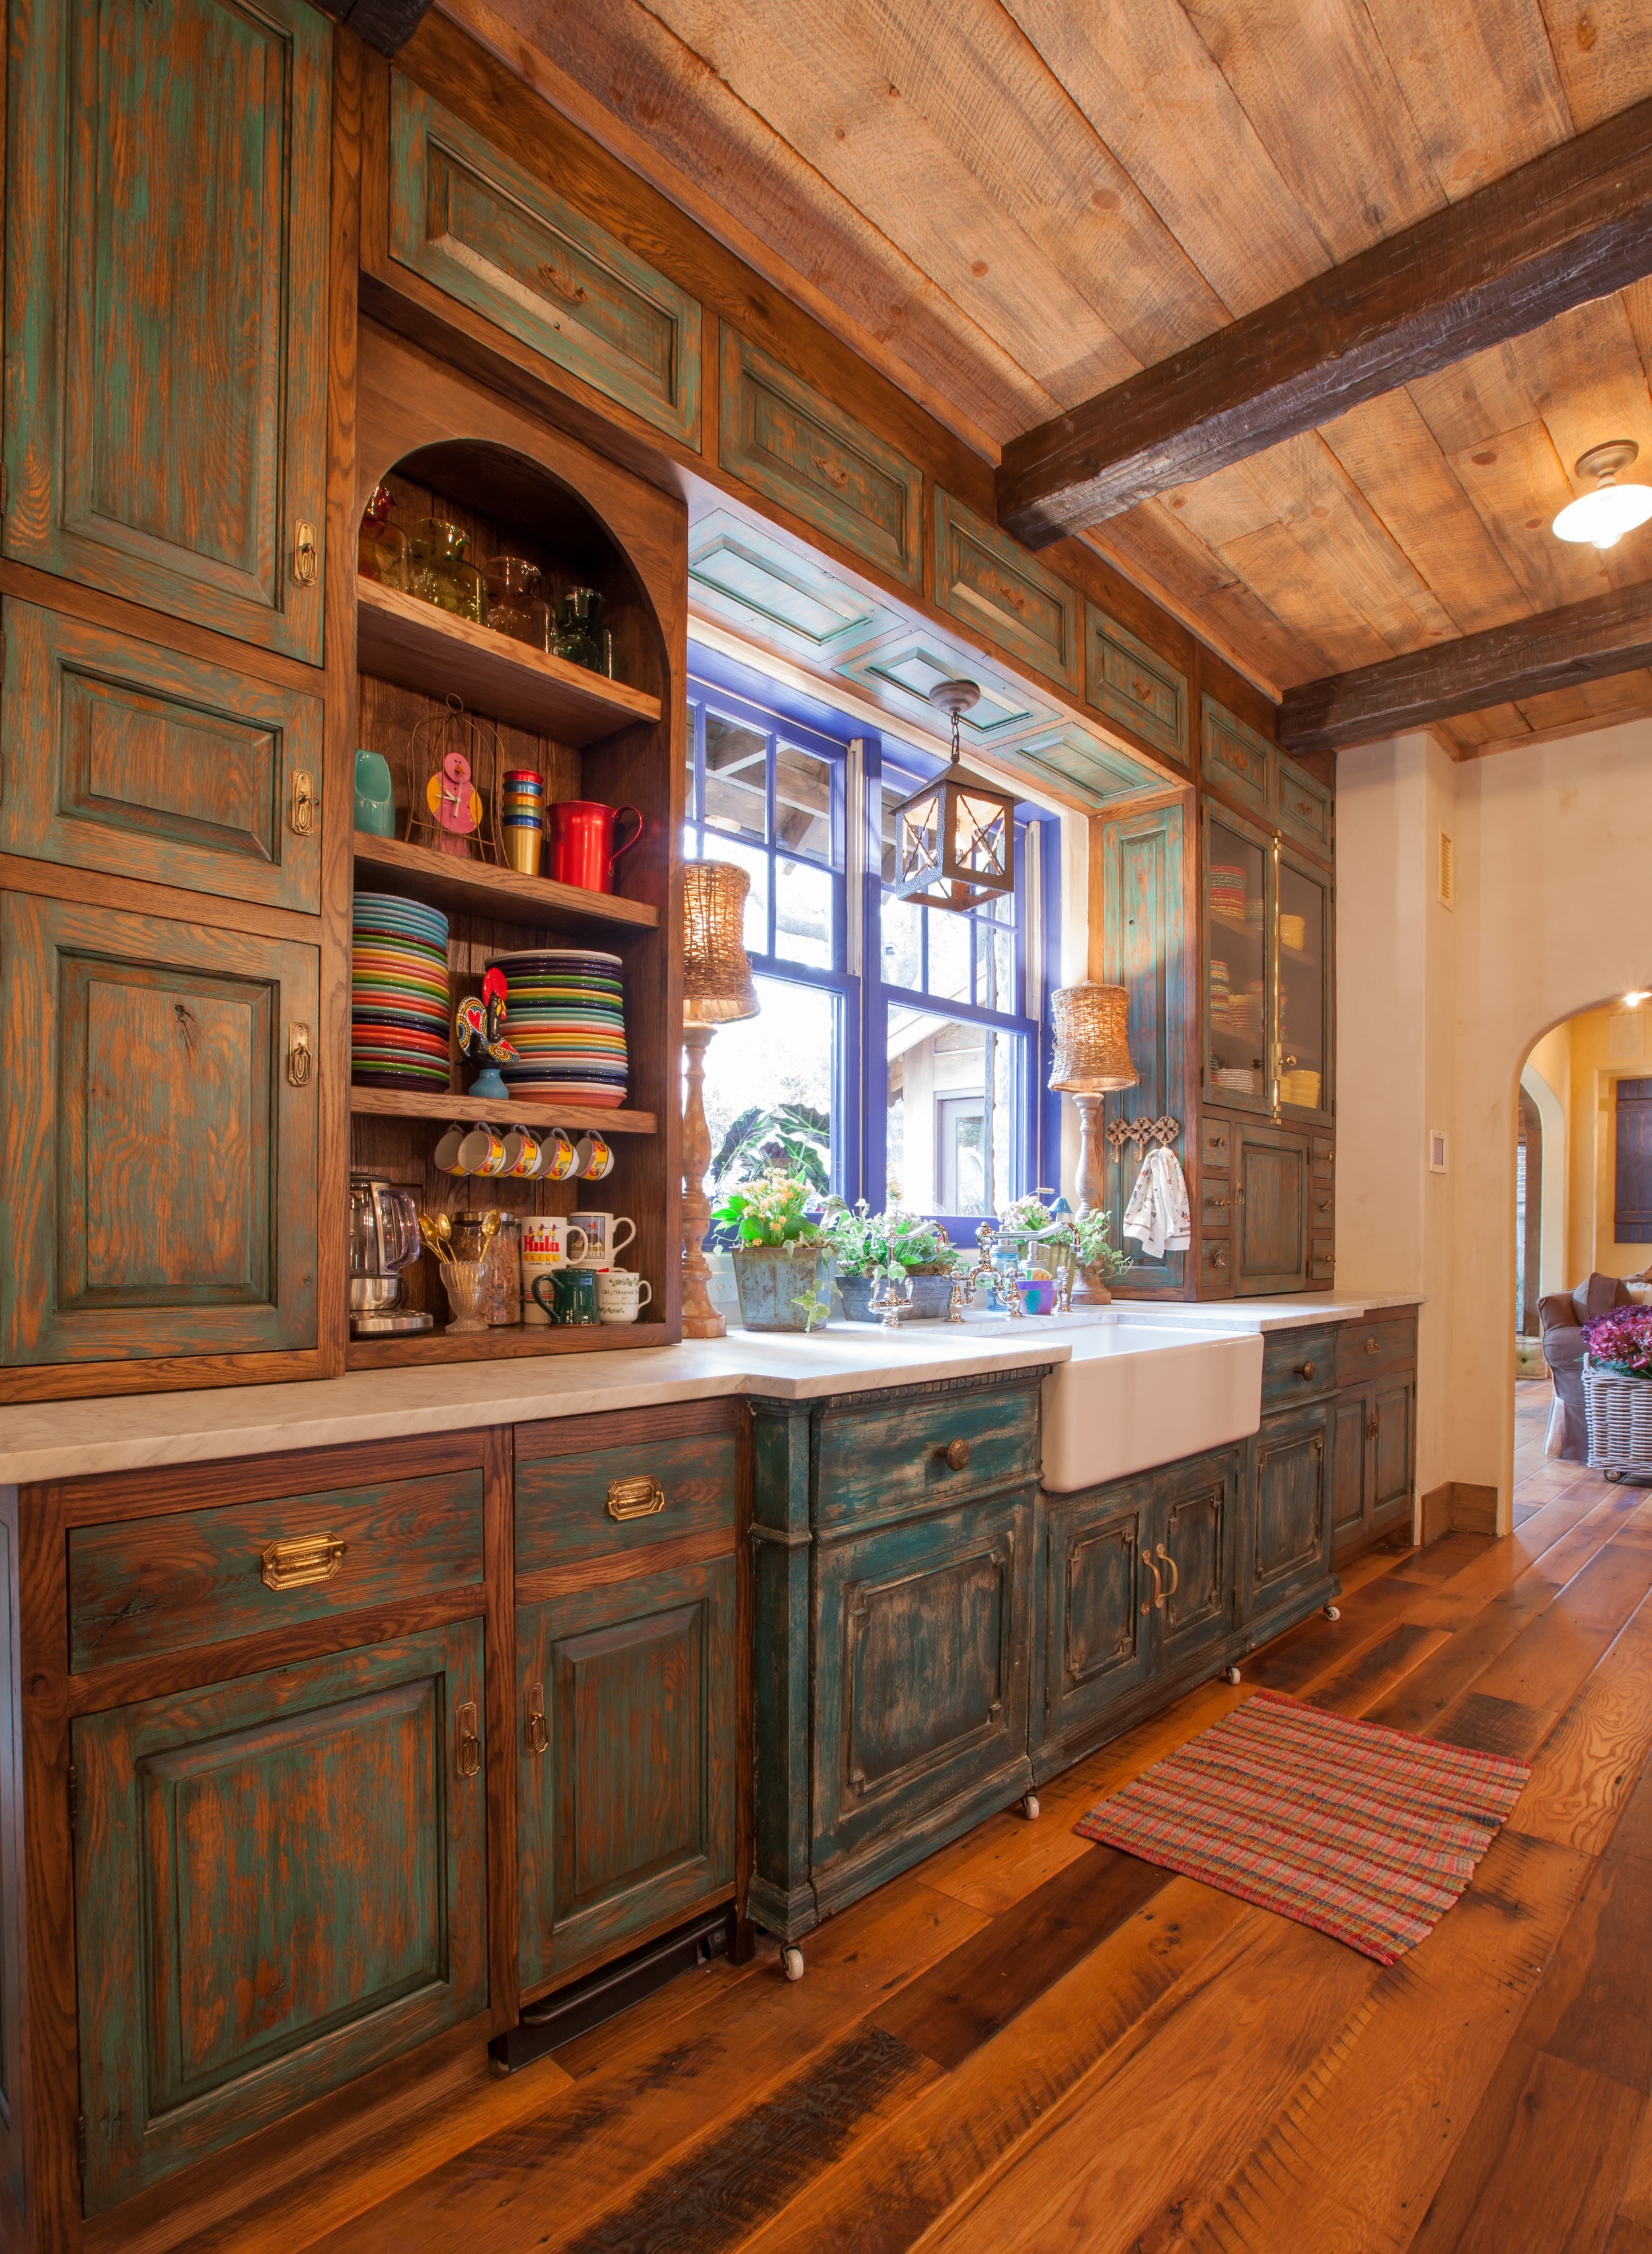 CARUTH- Kitchen cabinets.jpg